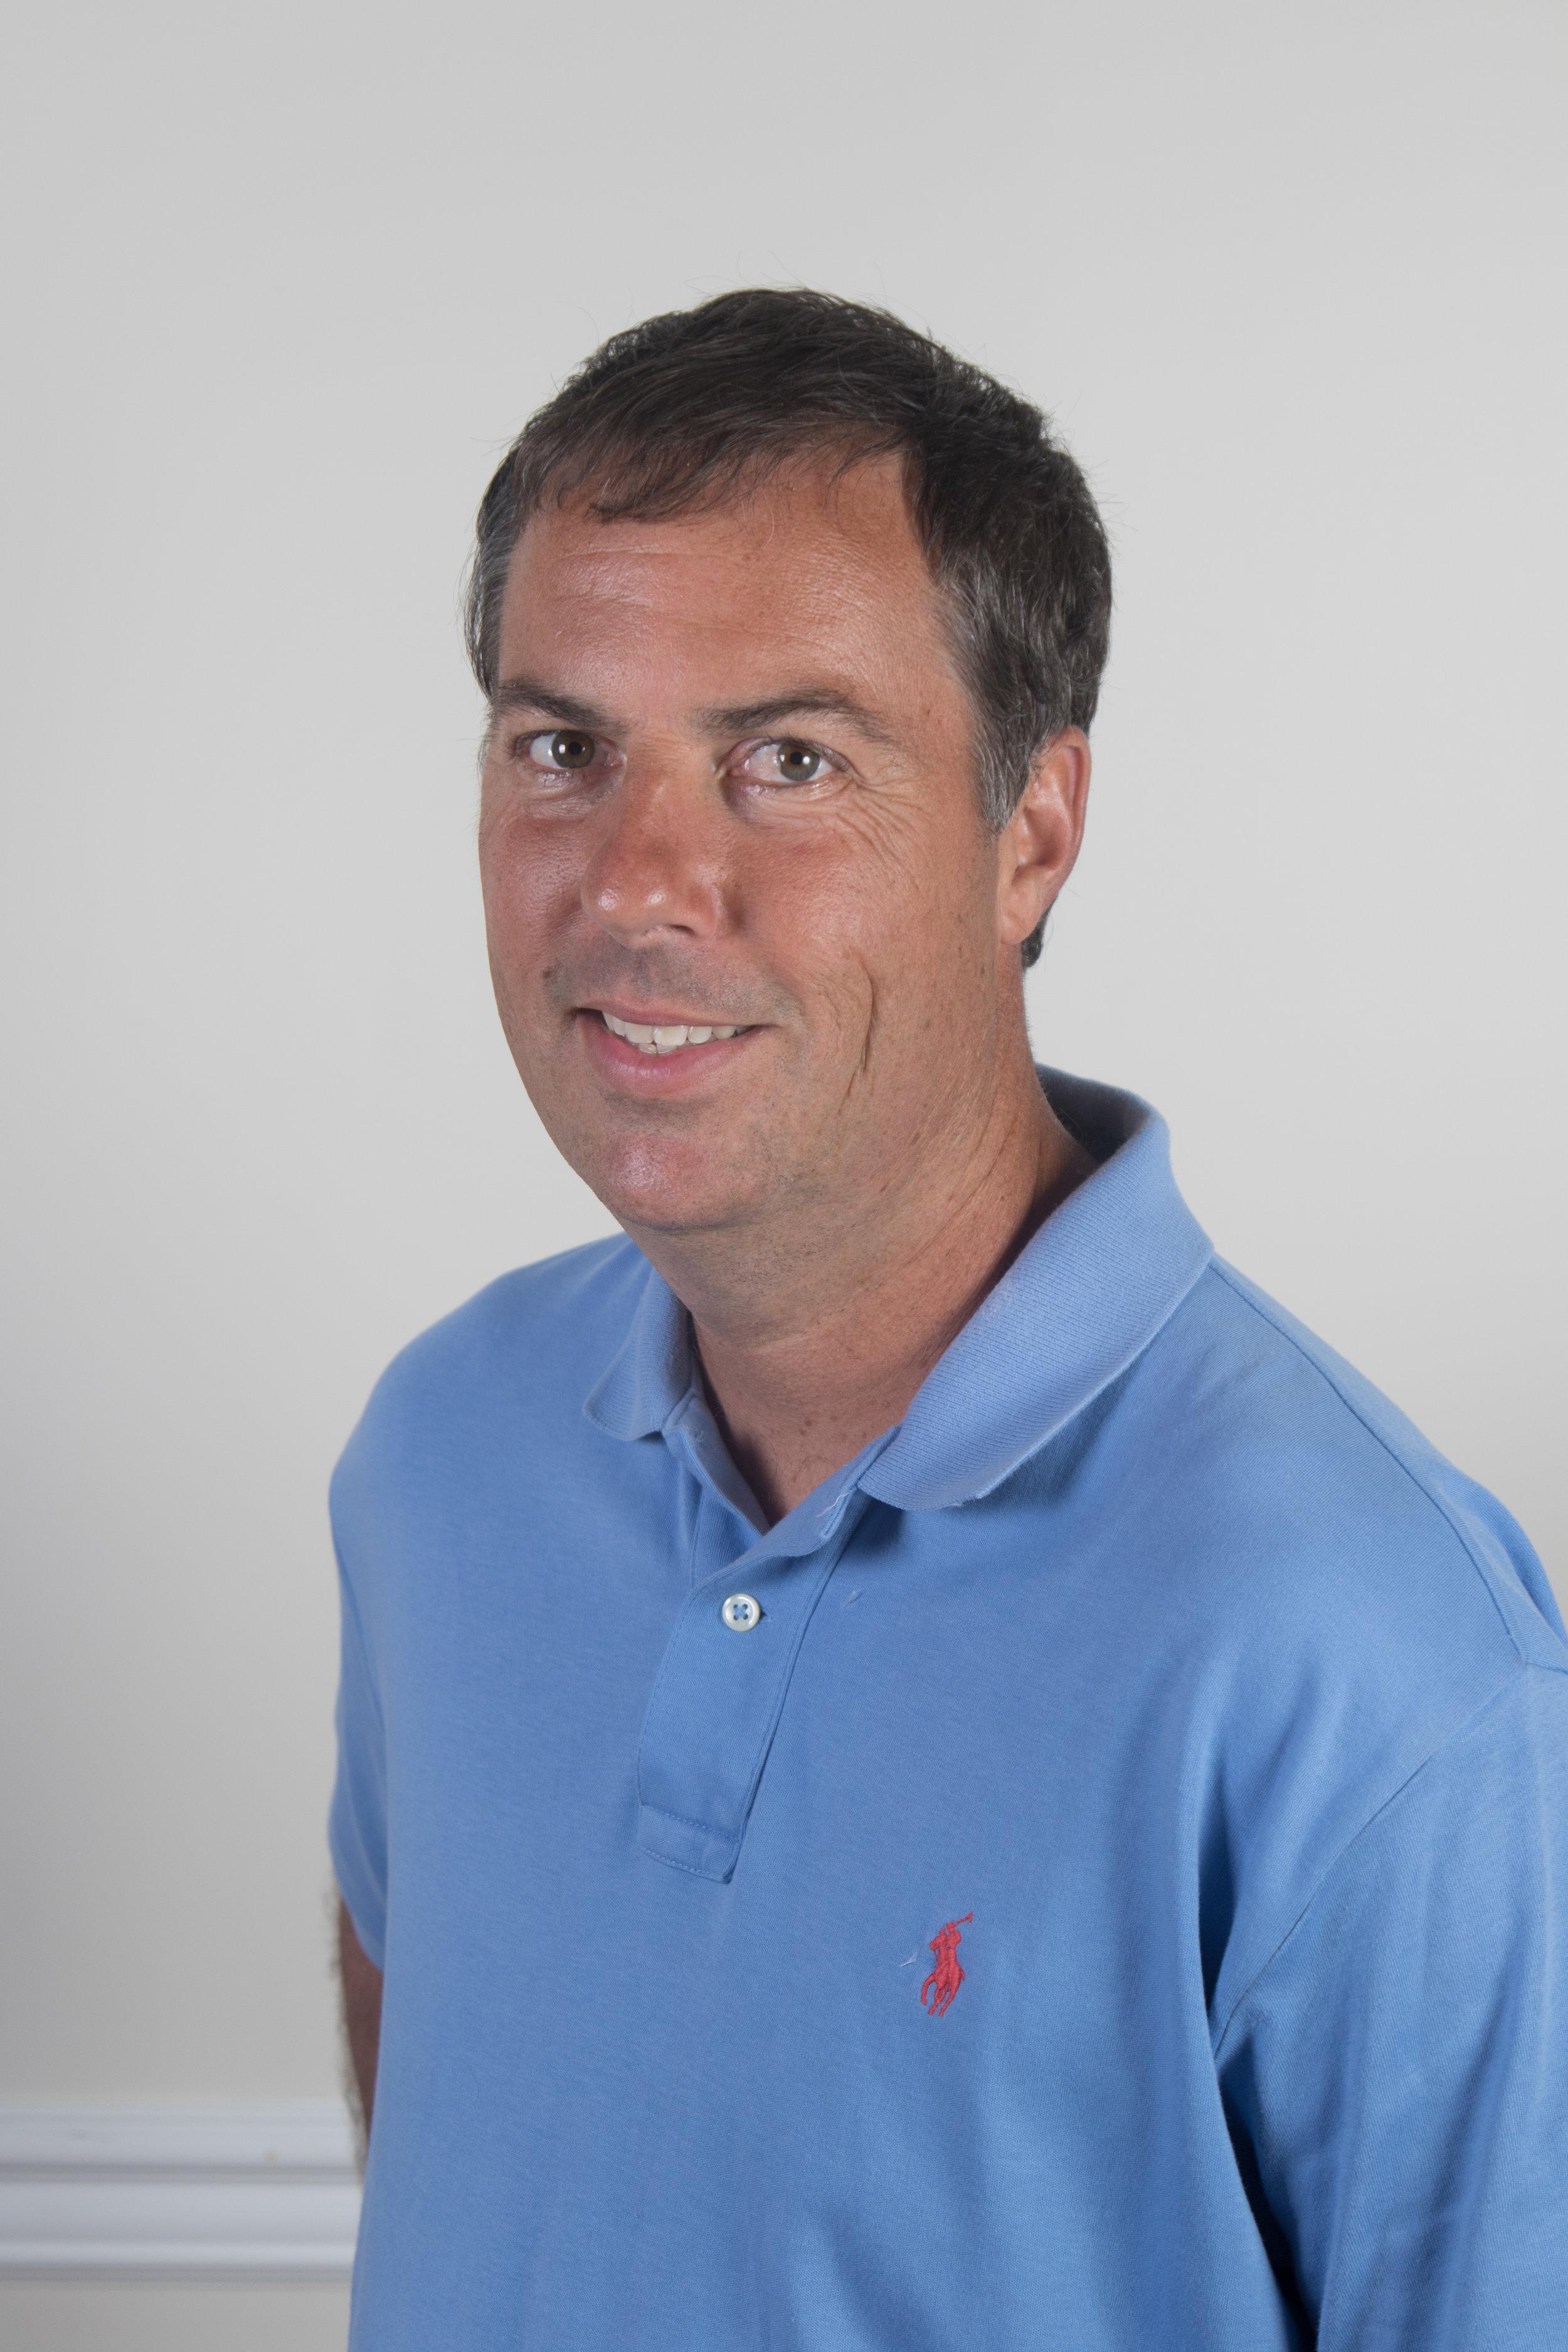 Eric Heisner, Owner